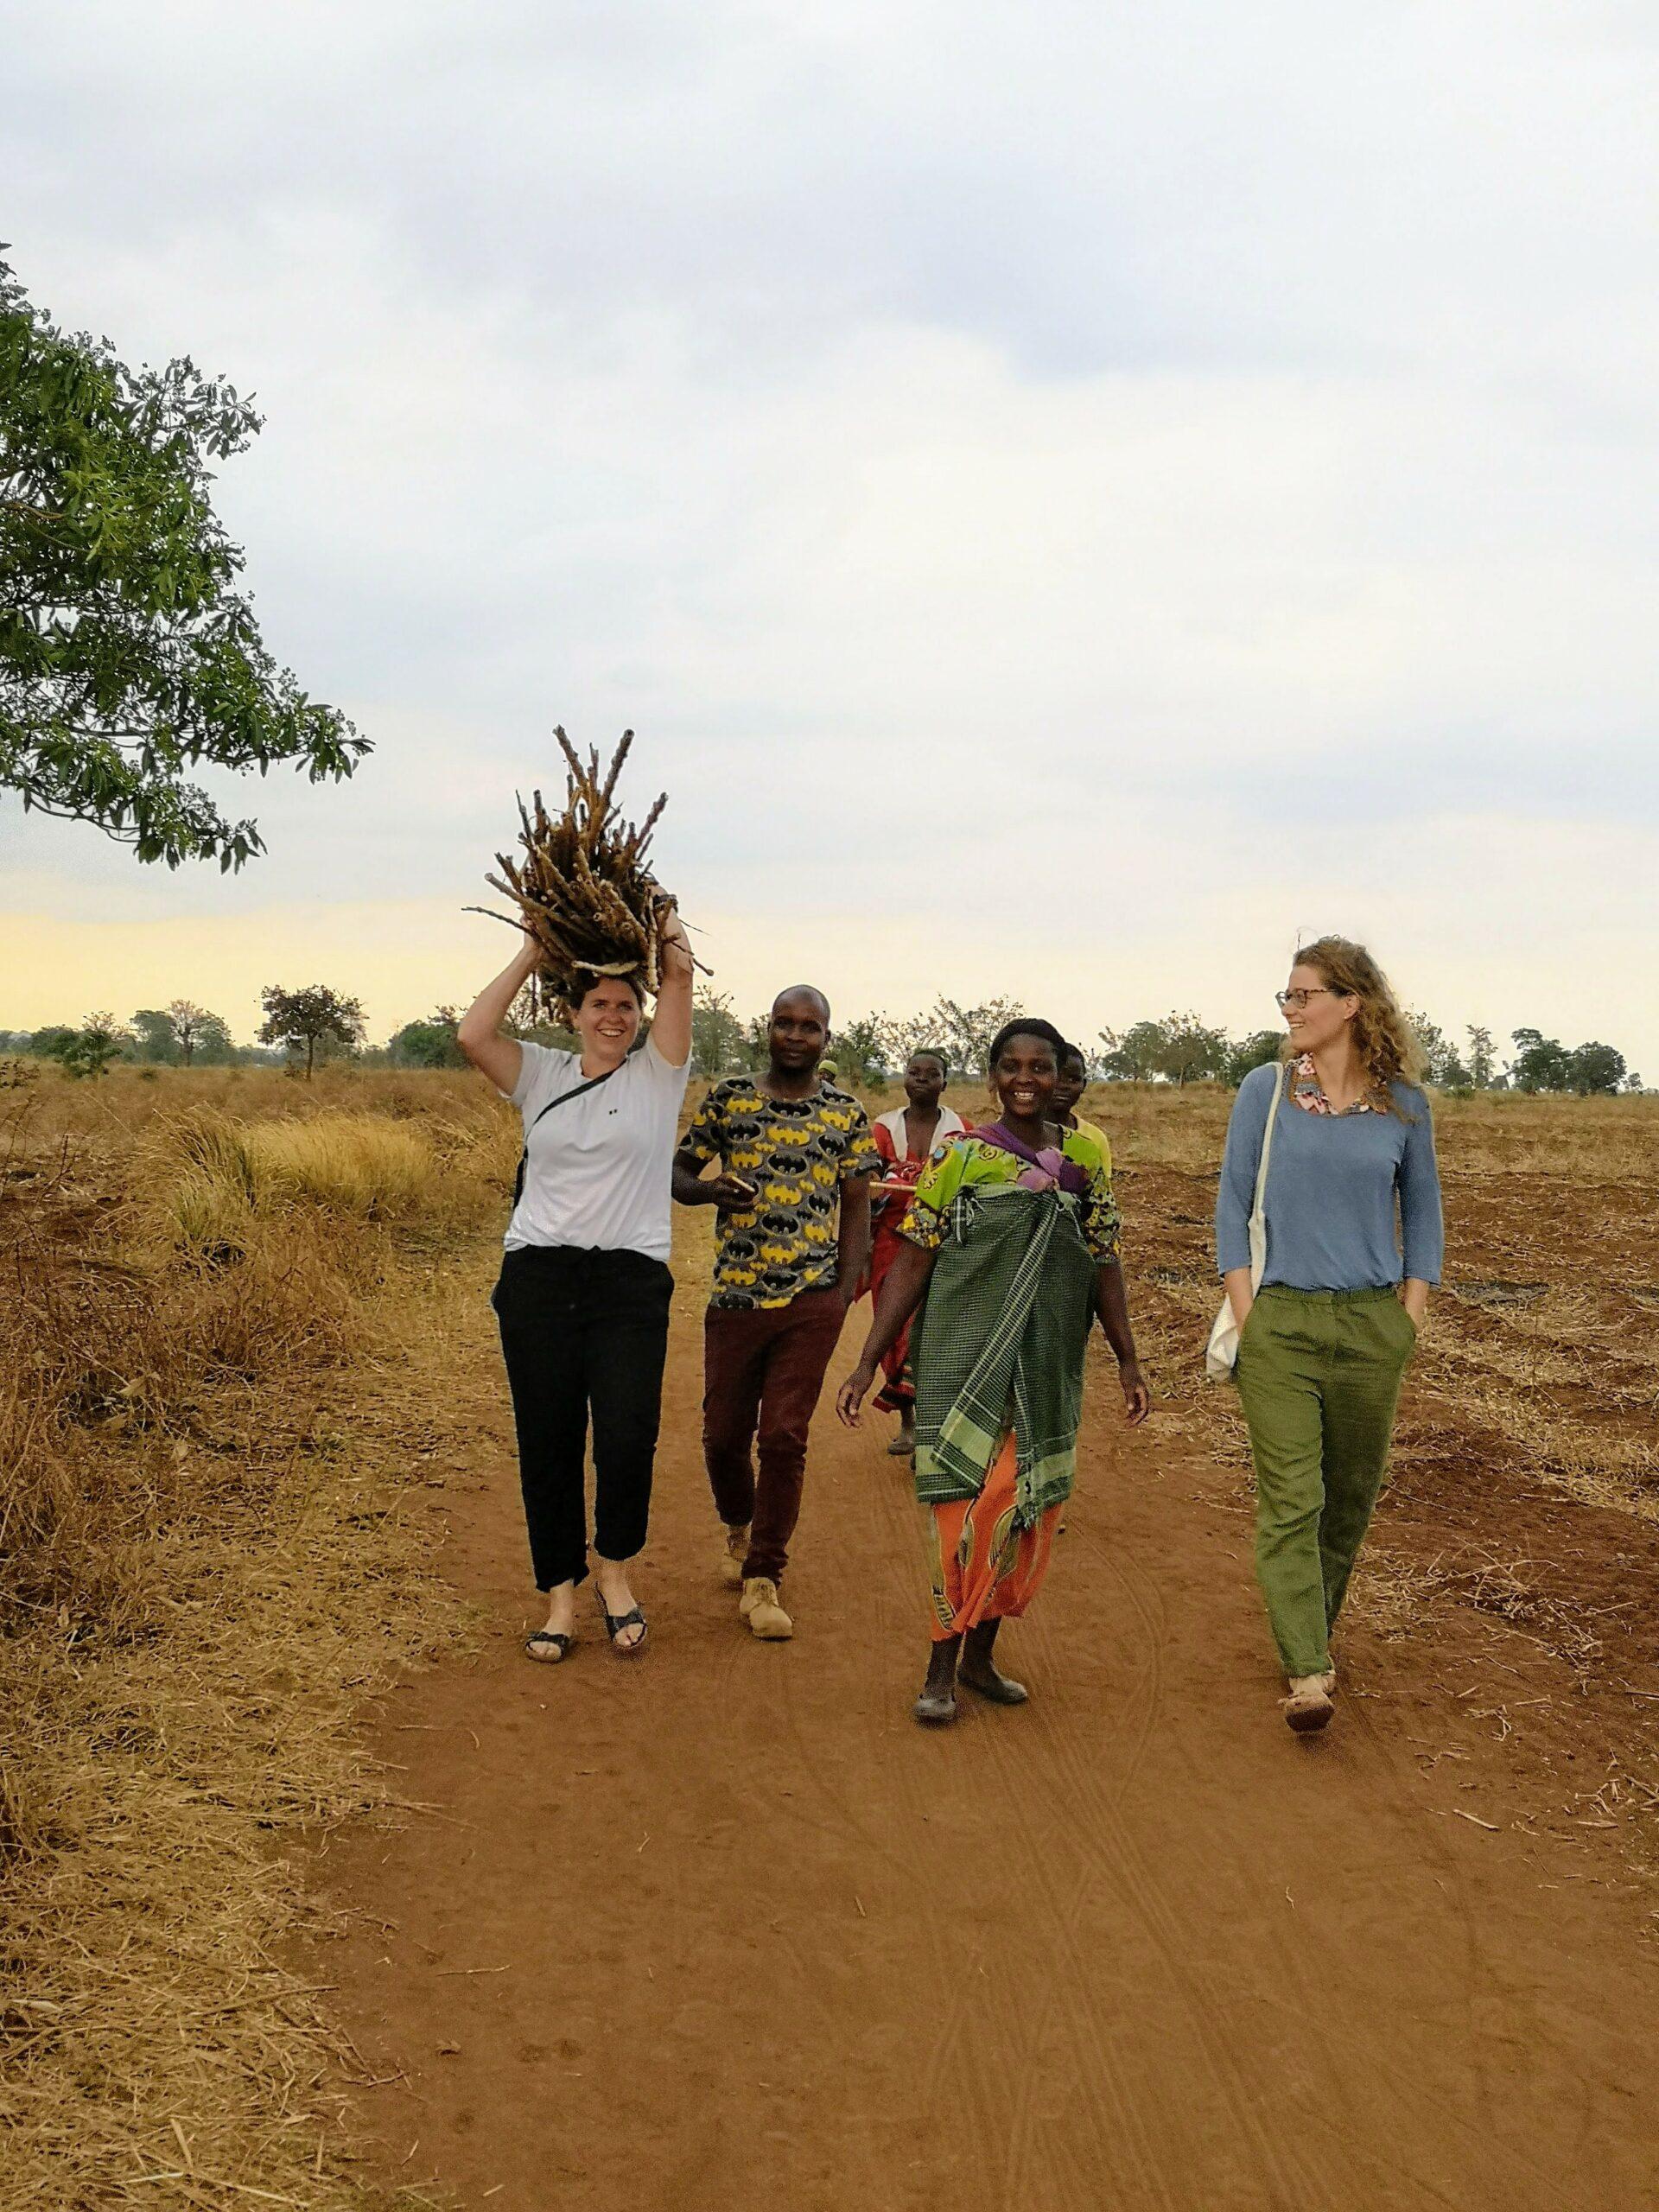 Travel like a local in Senegal